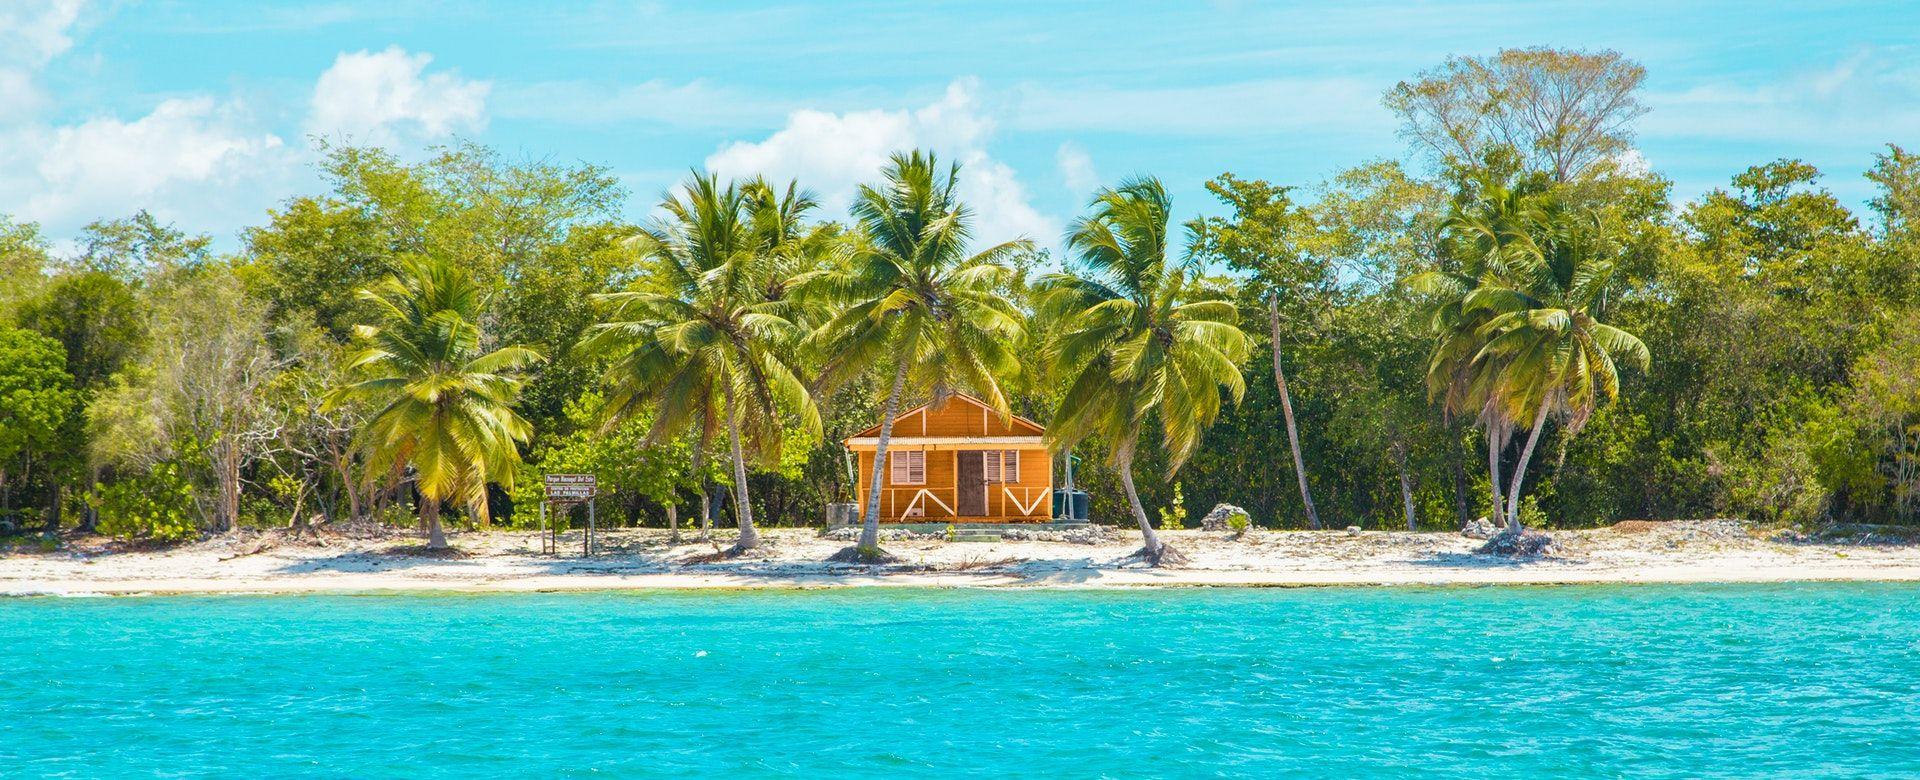 beach_caribbean_coast_2598683.jpg